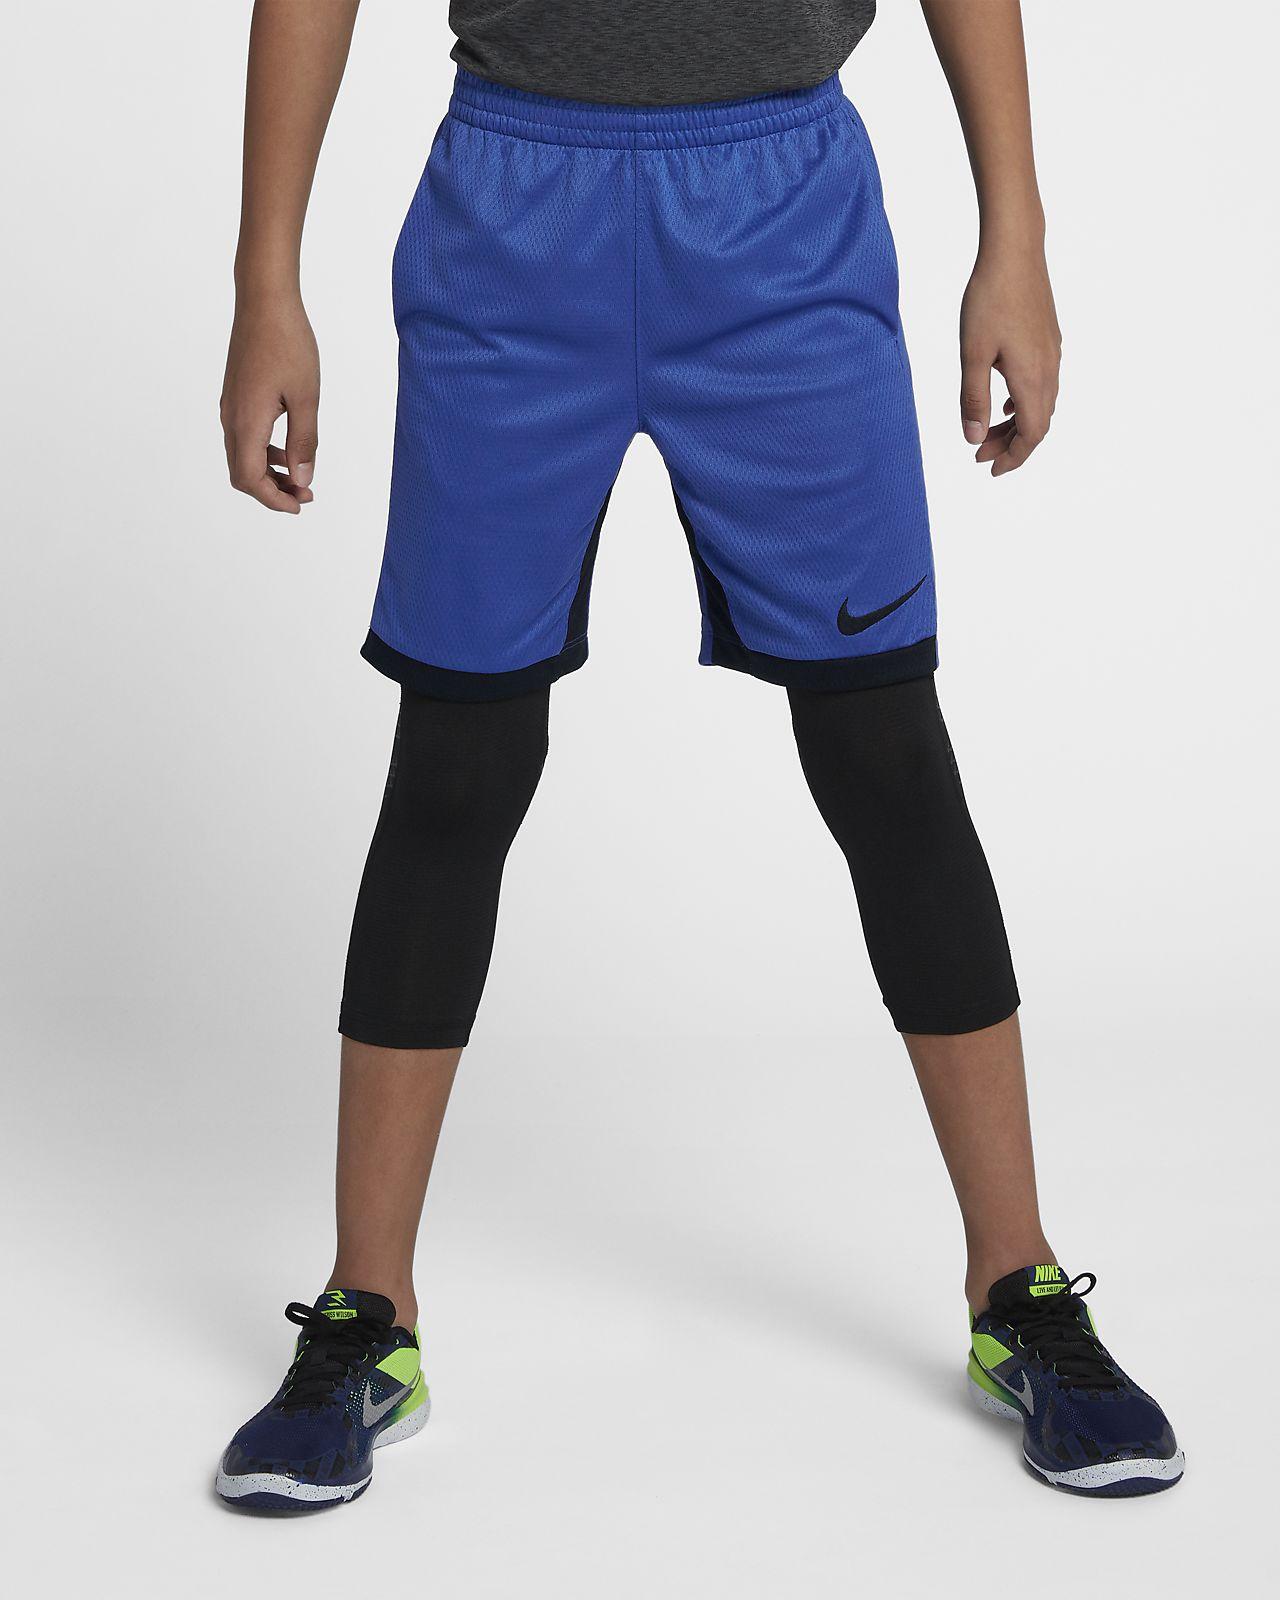 Nike Dri-FIT Trophy Older Kids' (Boys') 20cm (approx.) Training Shorts